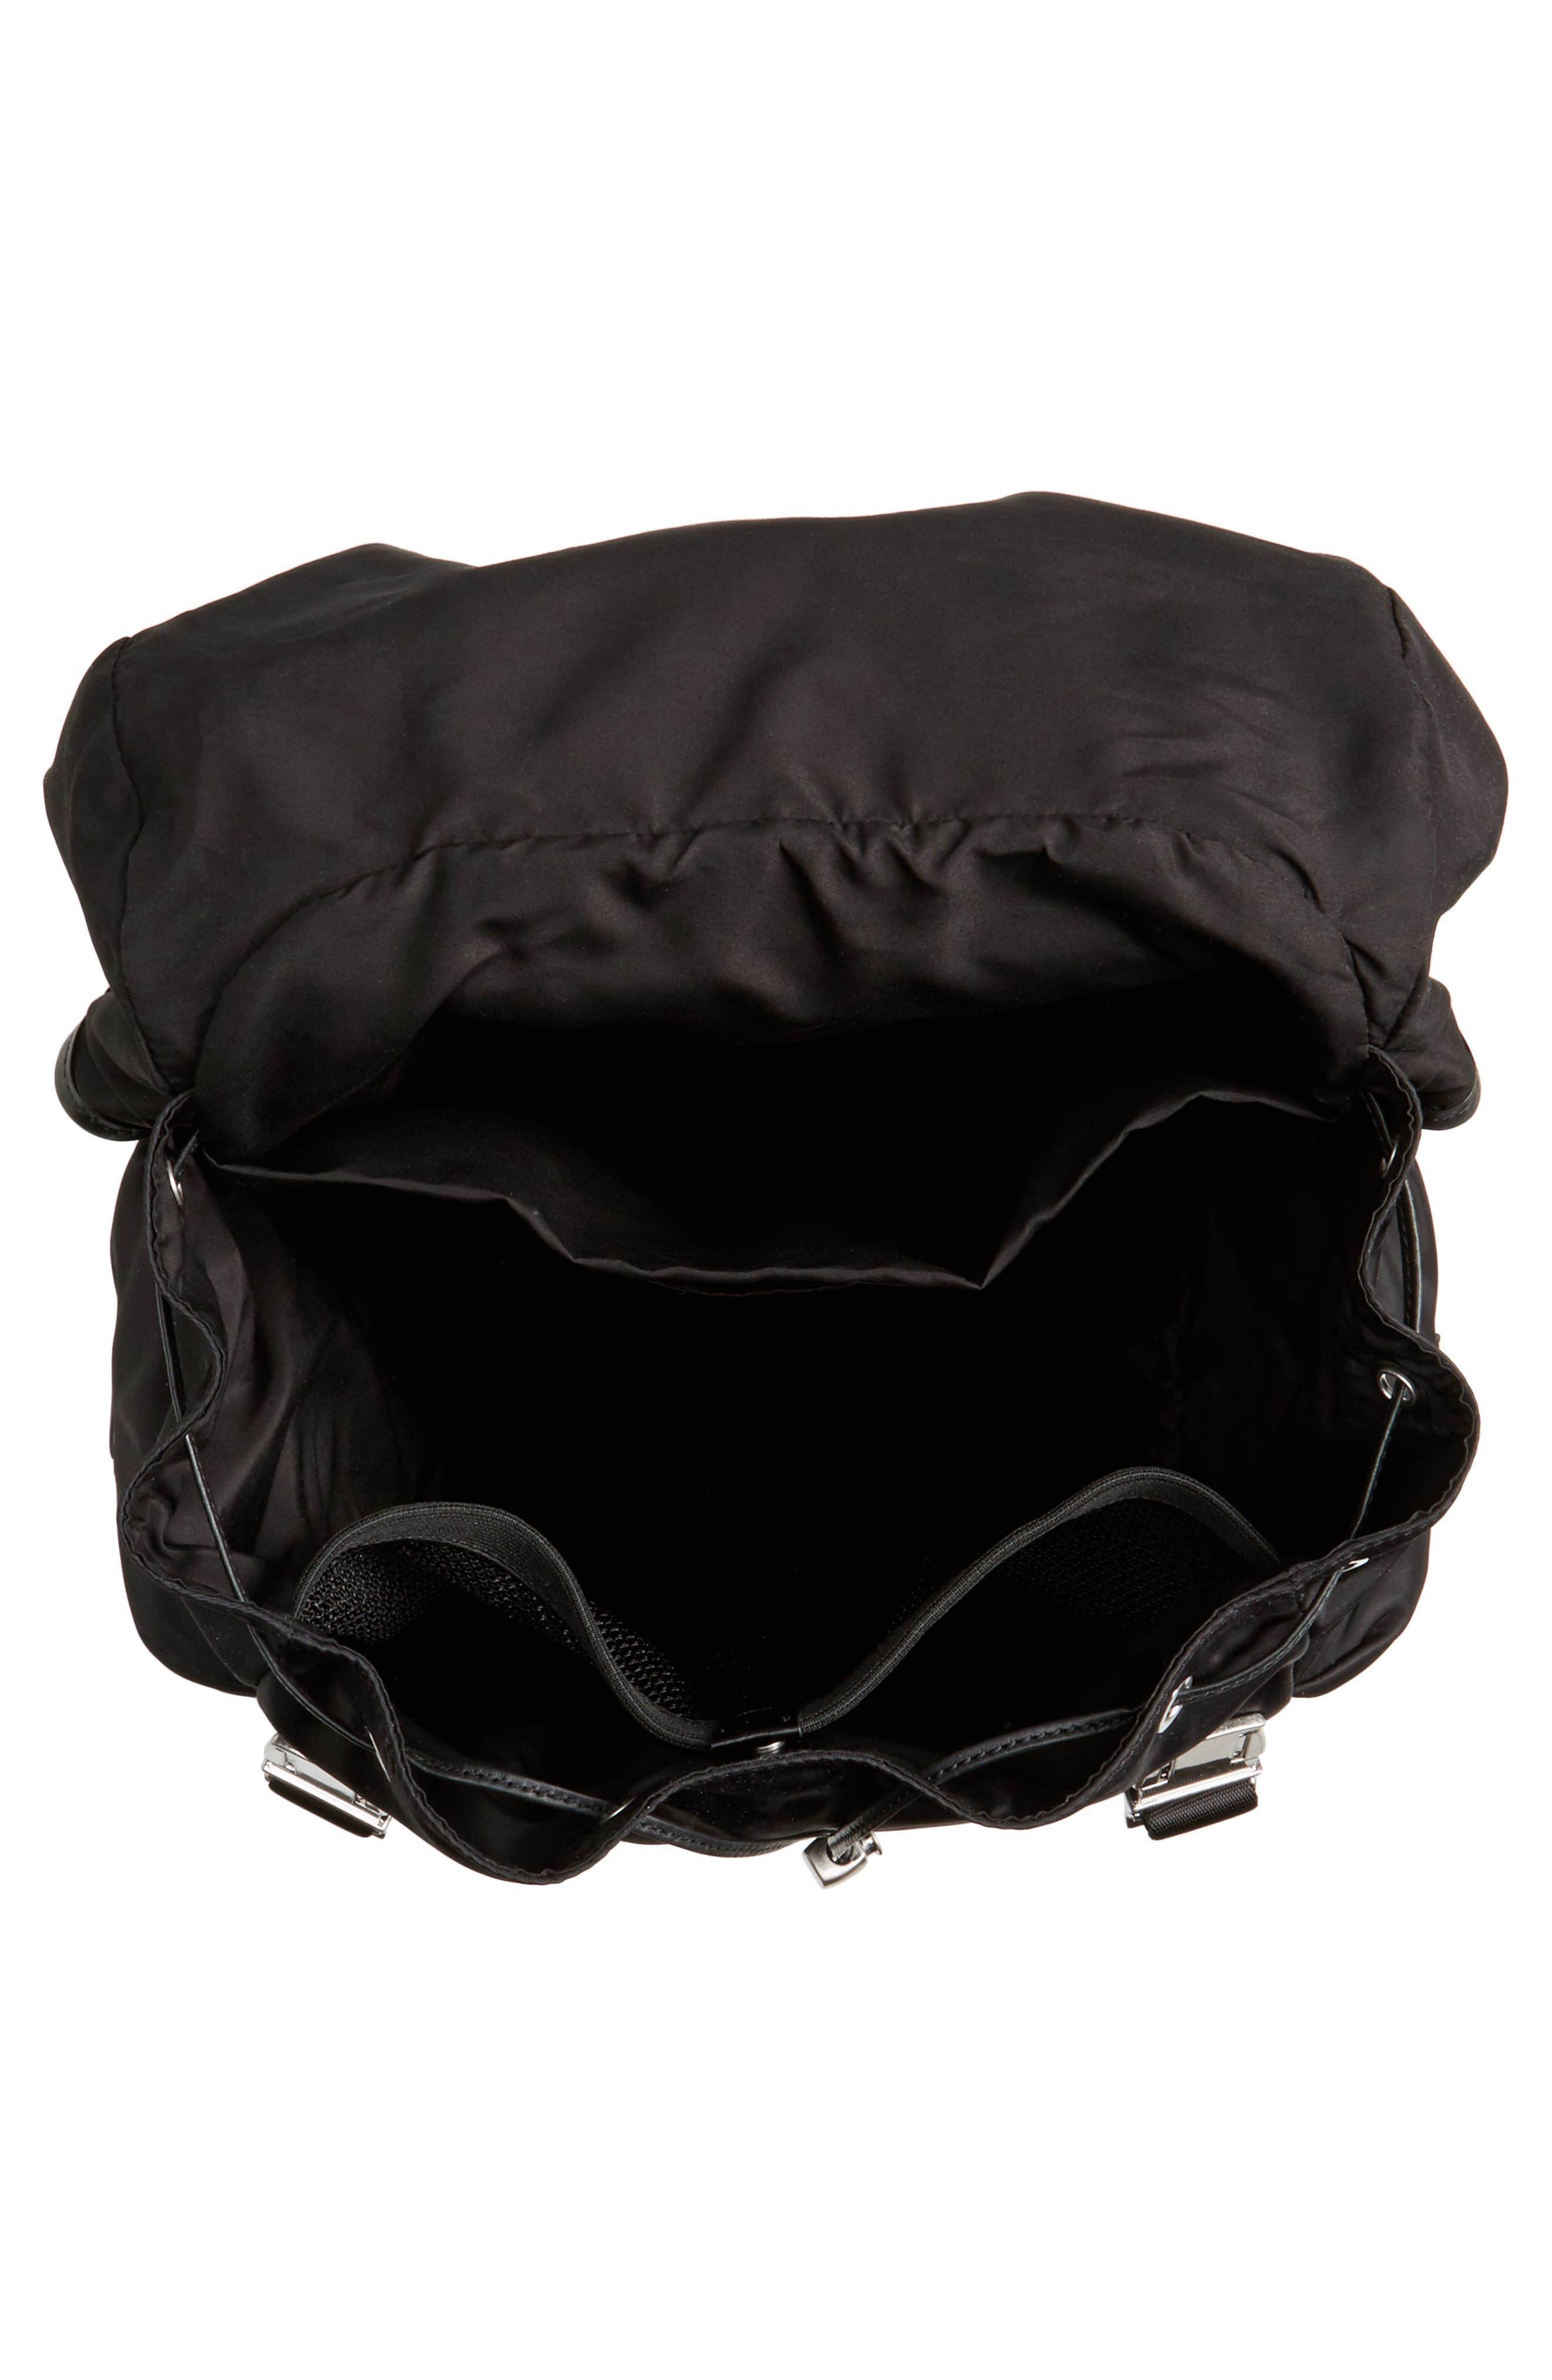 City Backpack,                             Alternate thumbnail 4, color,                             Black